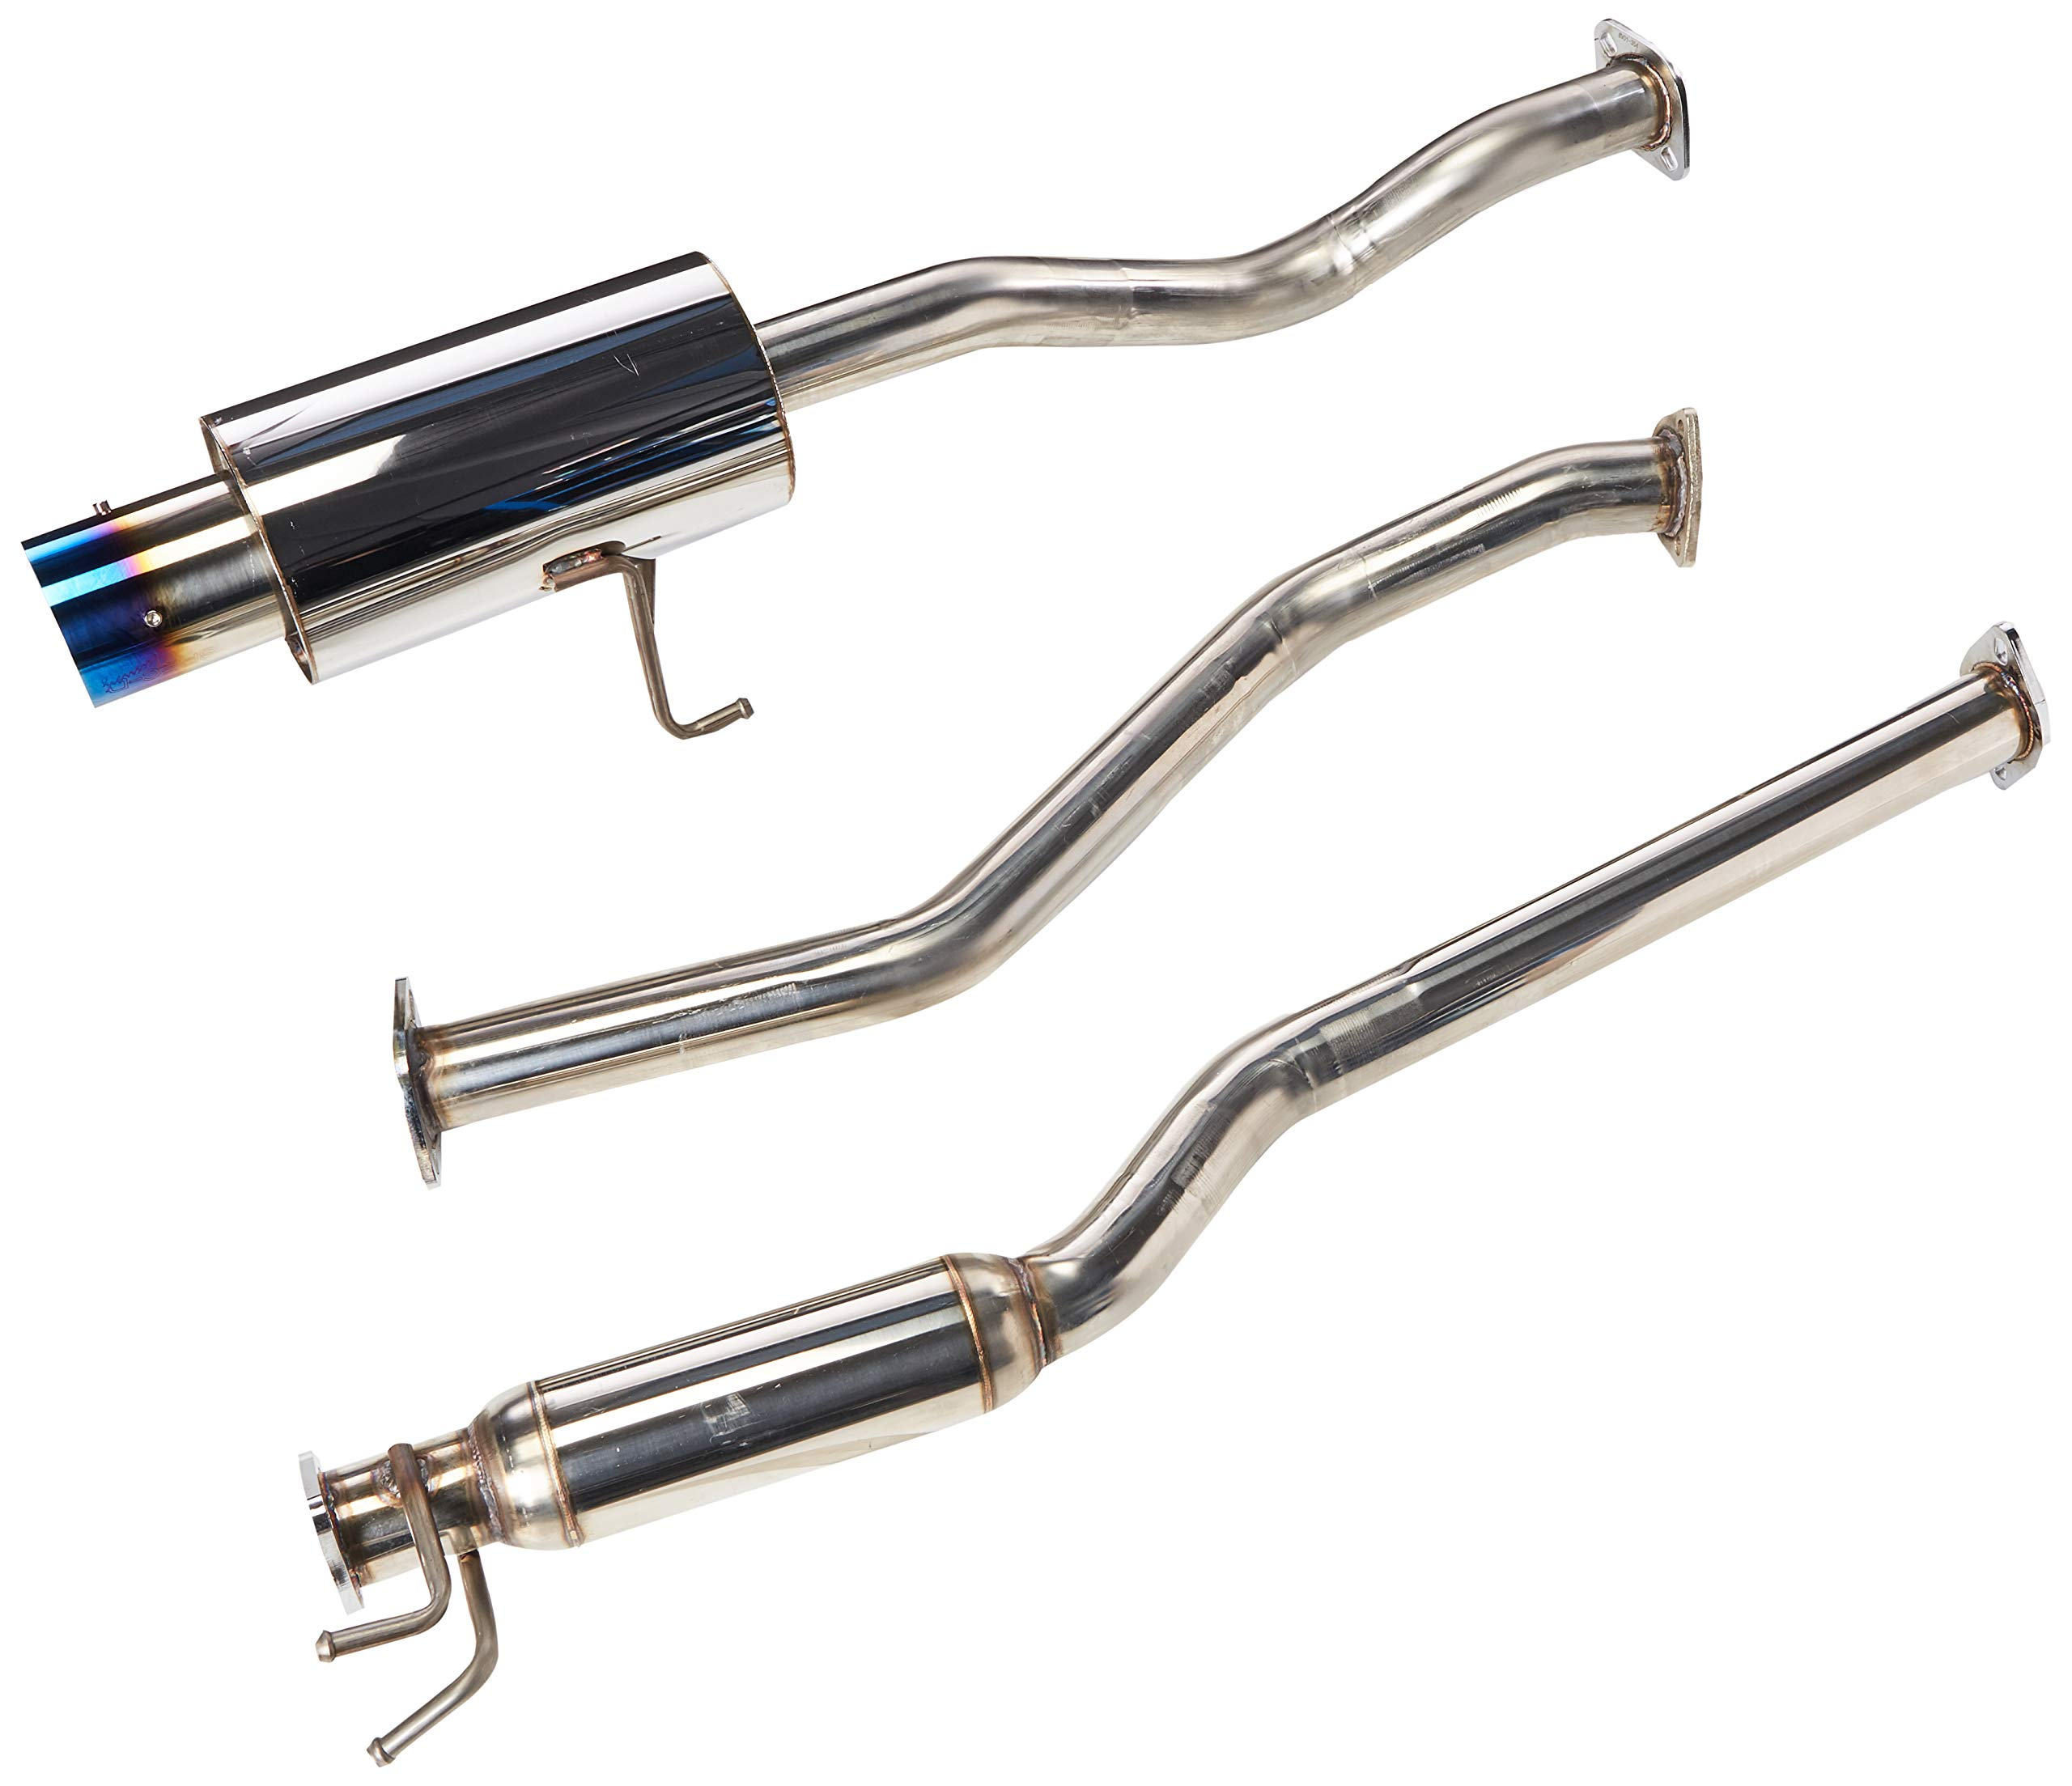 DNA Motoring HDSHC01EX Stainless Steel Exhaust Header Manifold HDS-HC01EX